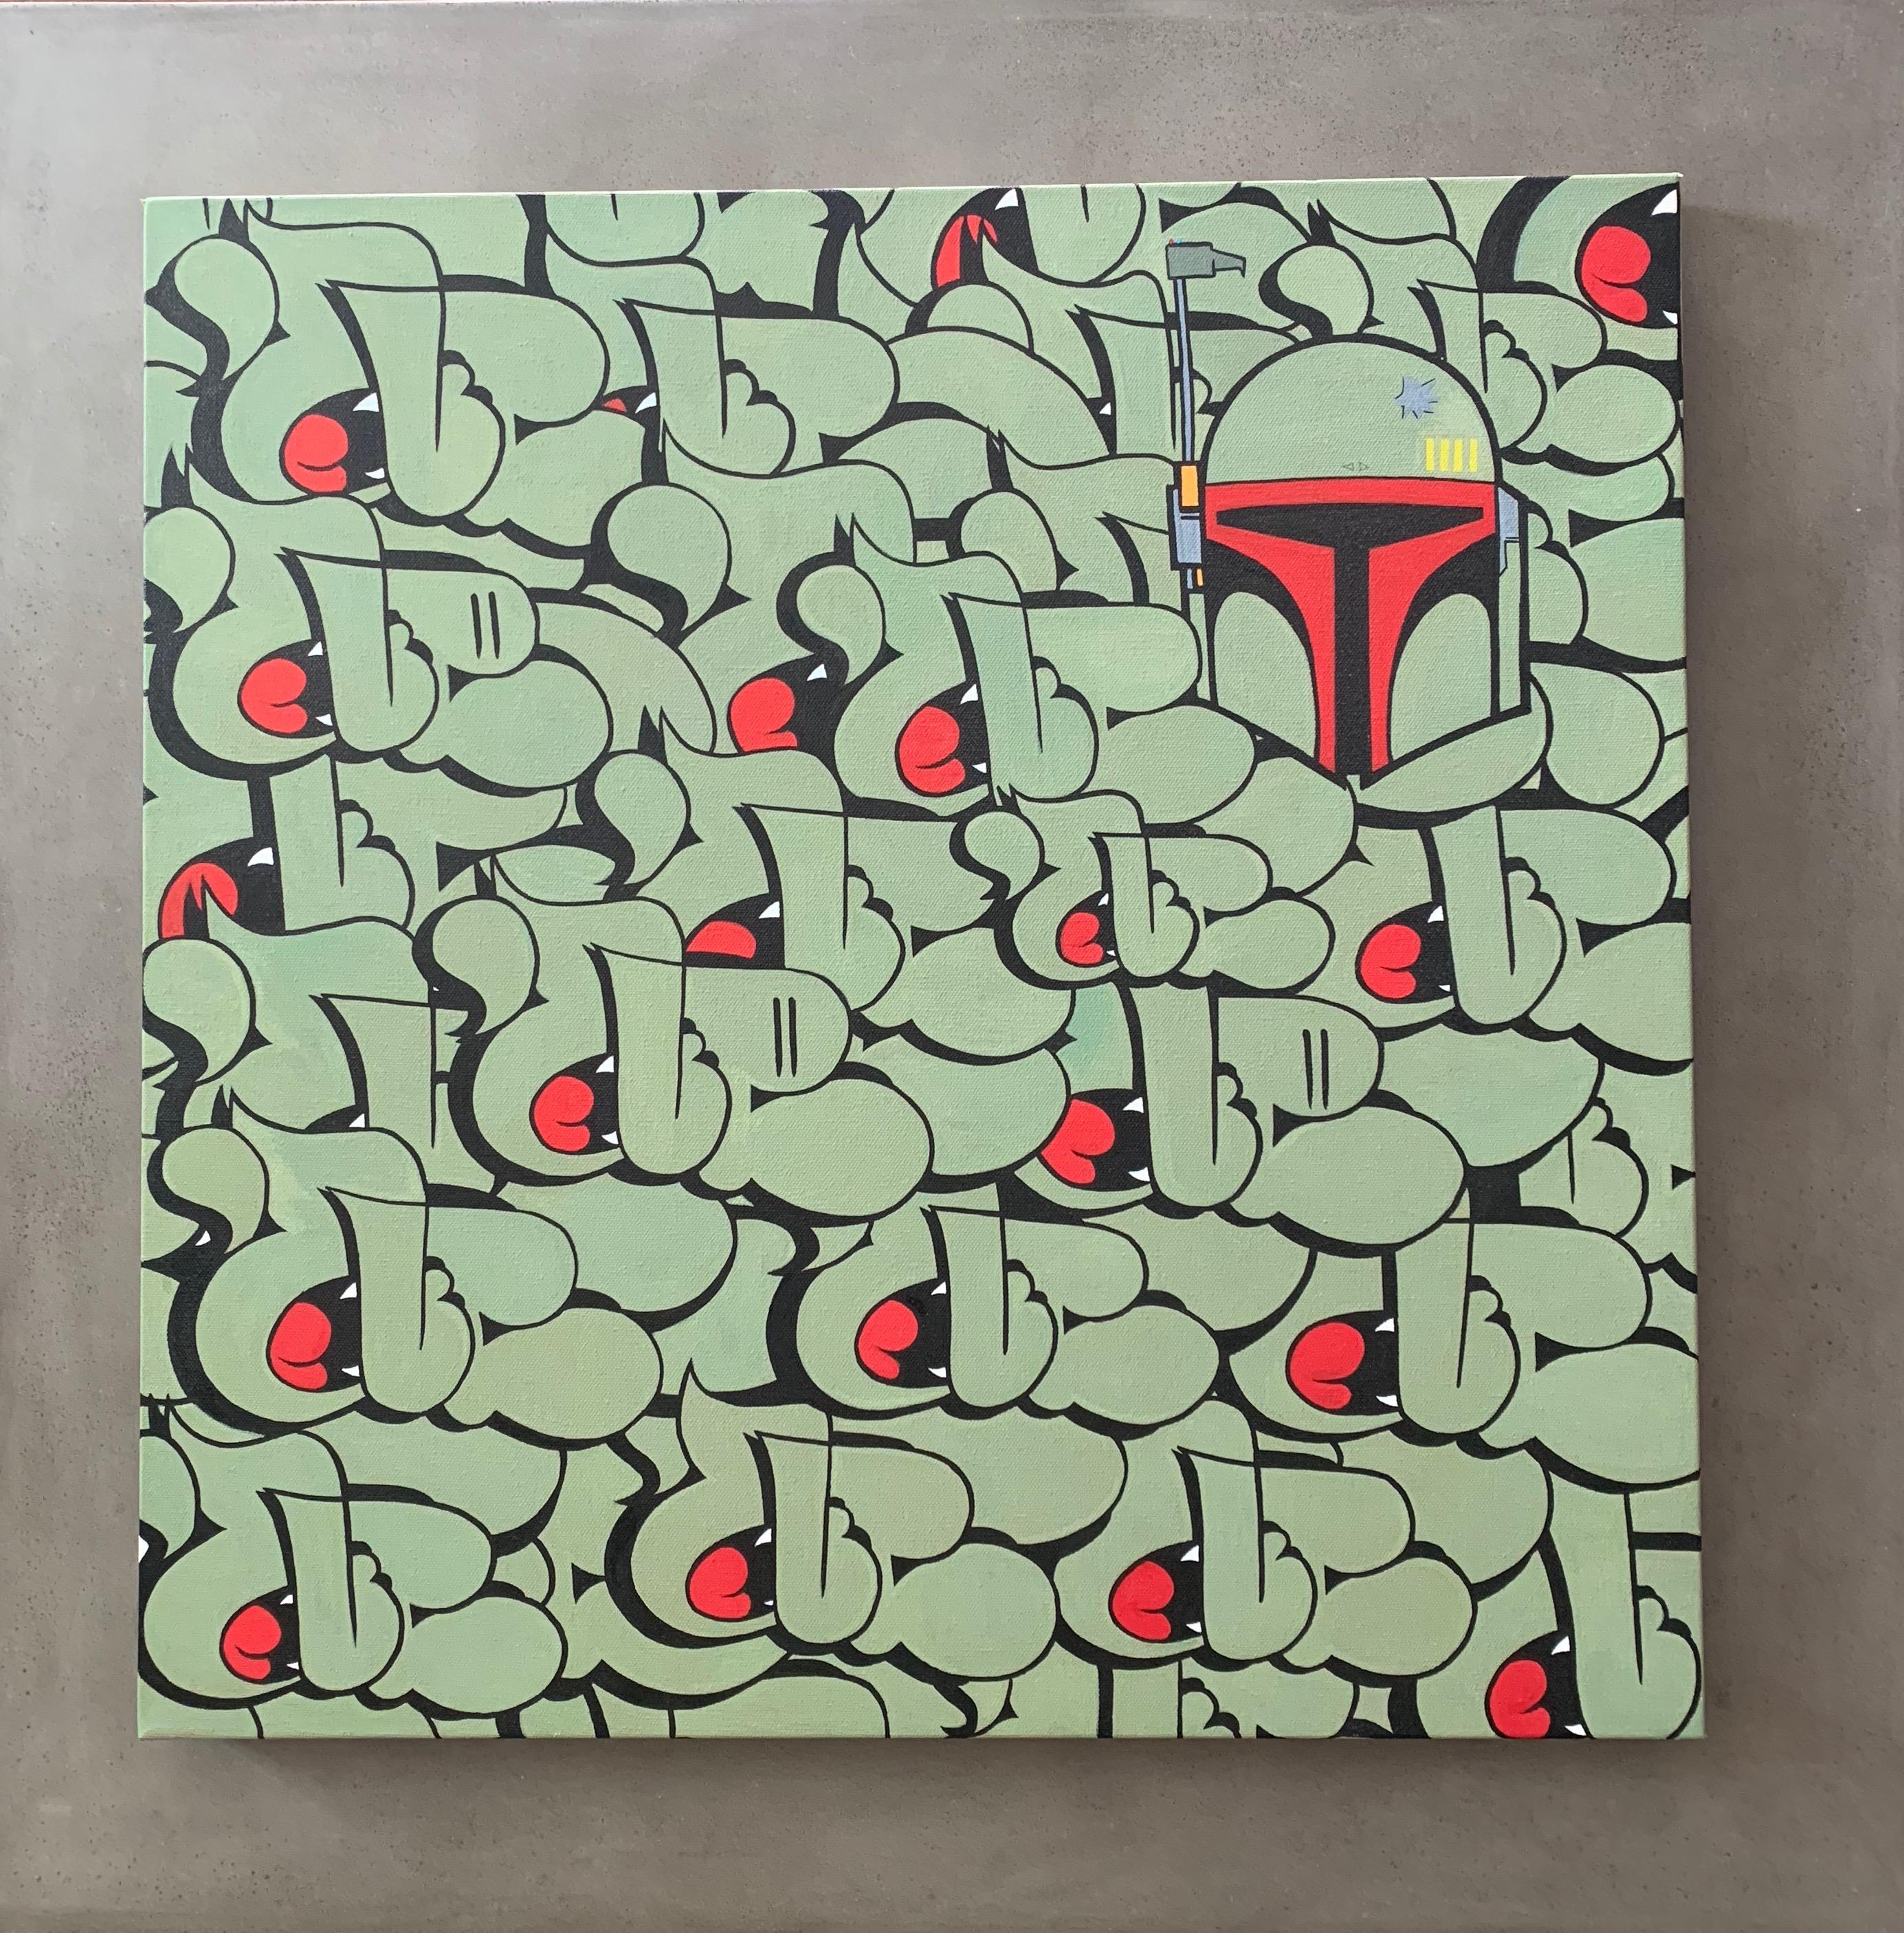 "Boba Fett x Nover, 24x24"" Acrylic on Canvas. 2016."